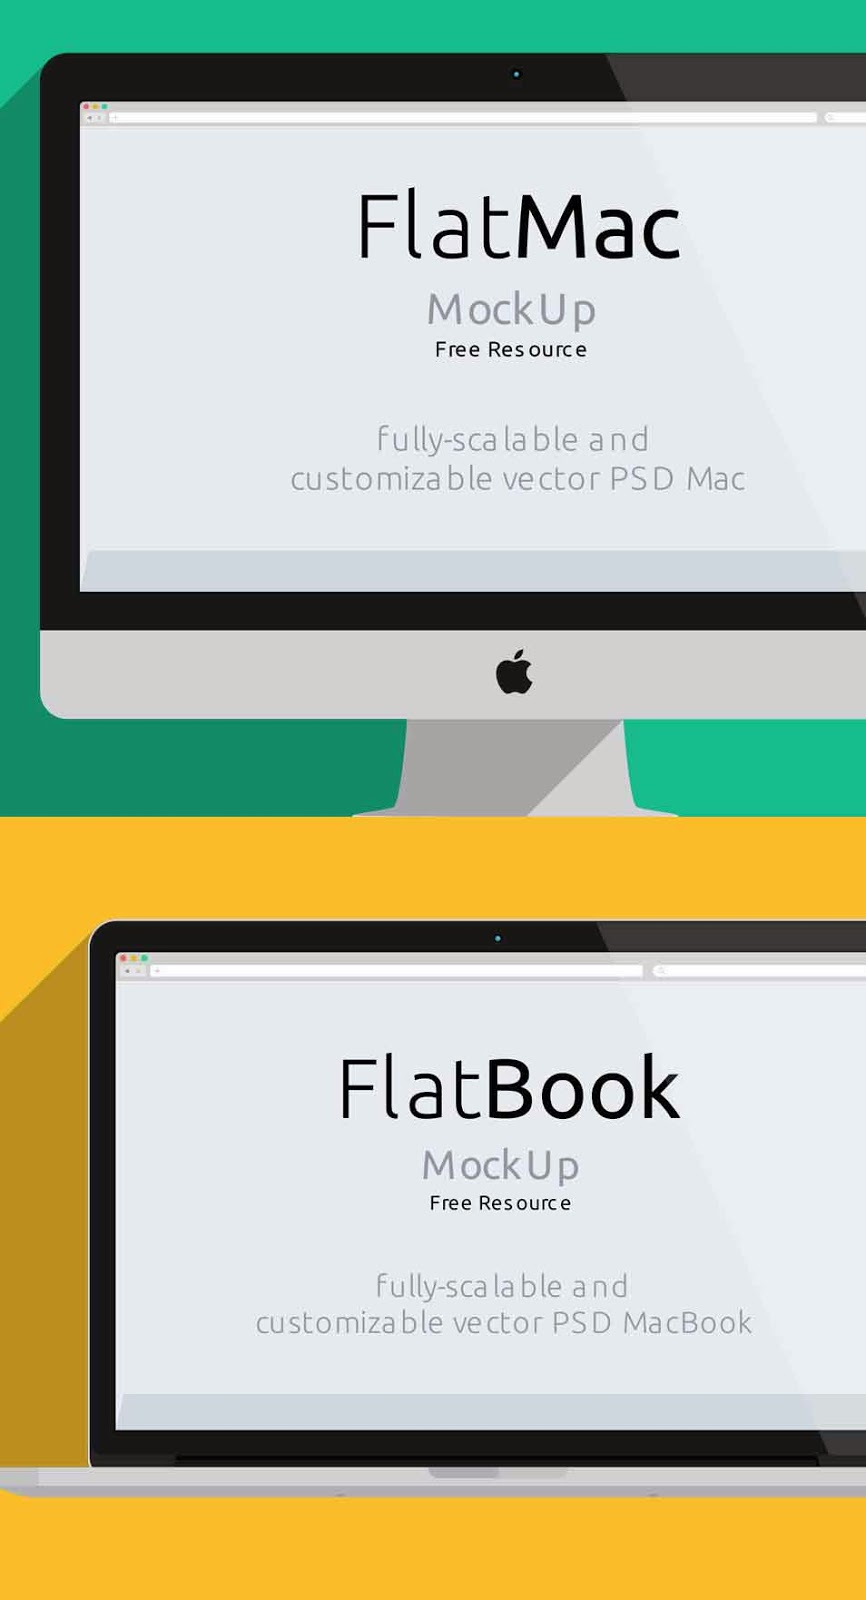 Flat iMac and Macbook PSD Mockup